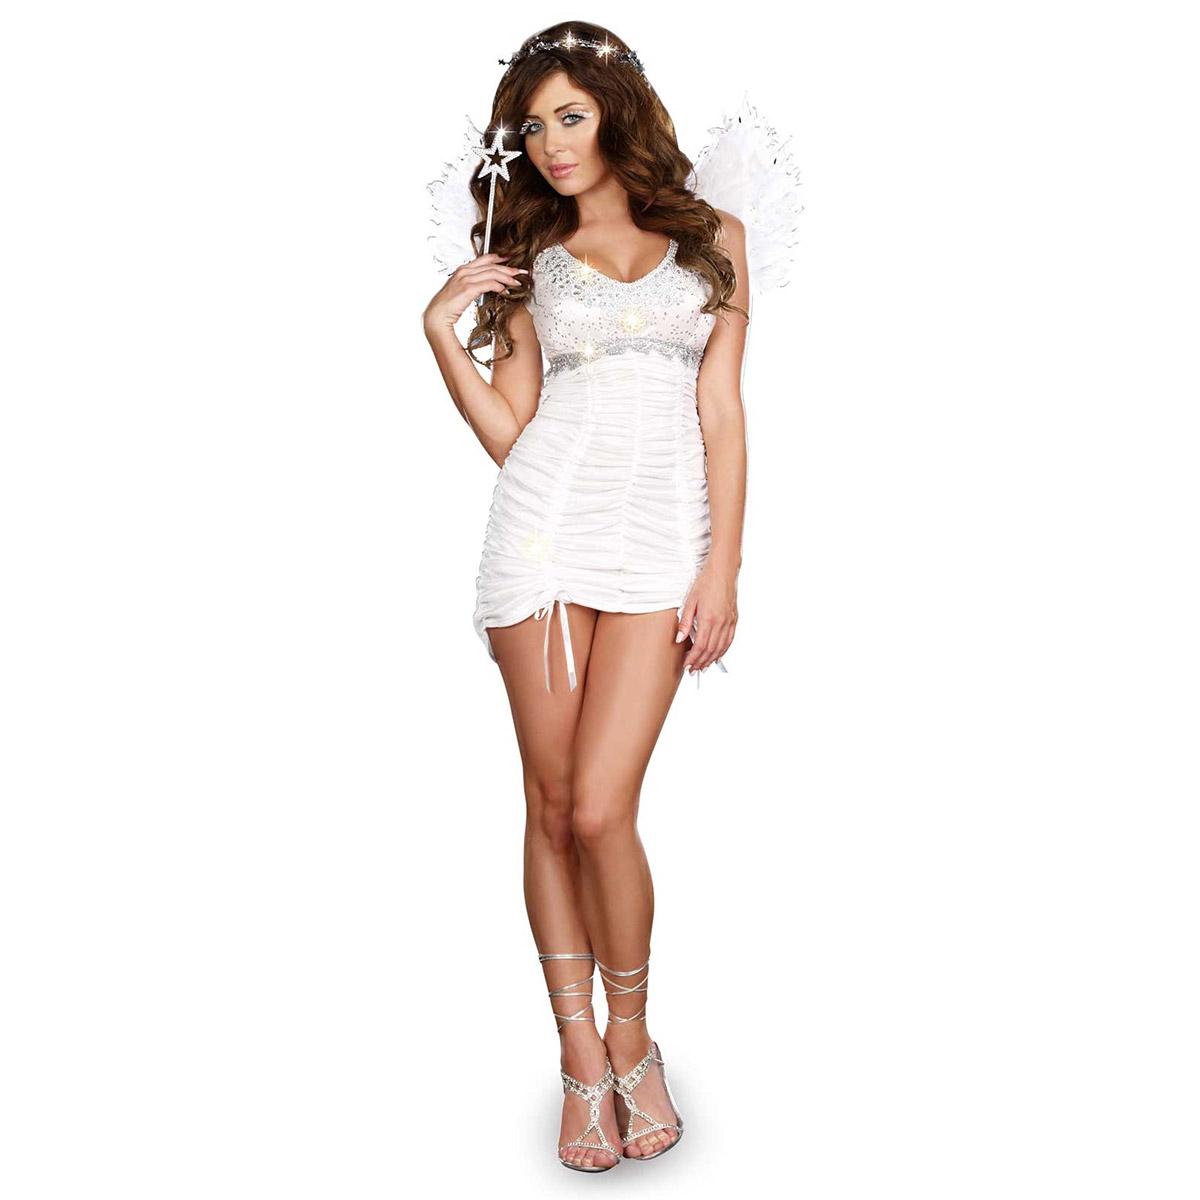 Halloween costumes adult cosplay costume Angel Angel fallen angel mini skirt white Angel adult costume  sc 1 st  Rakuten & acomes | Rakuten Global Market: Halloween costumes adult cosplay ...